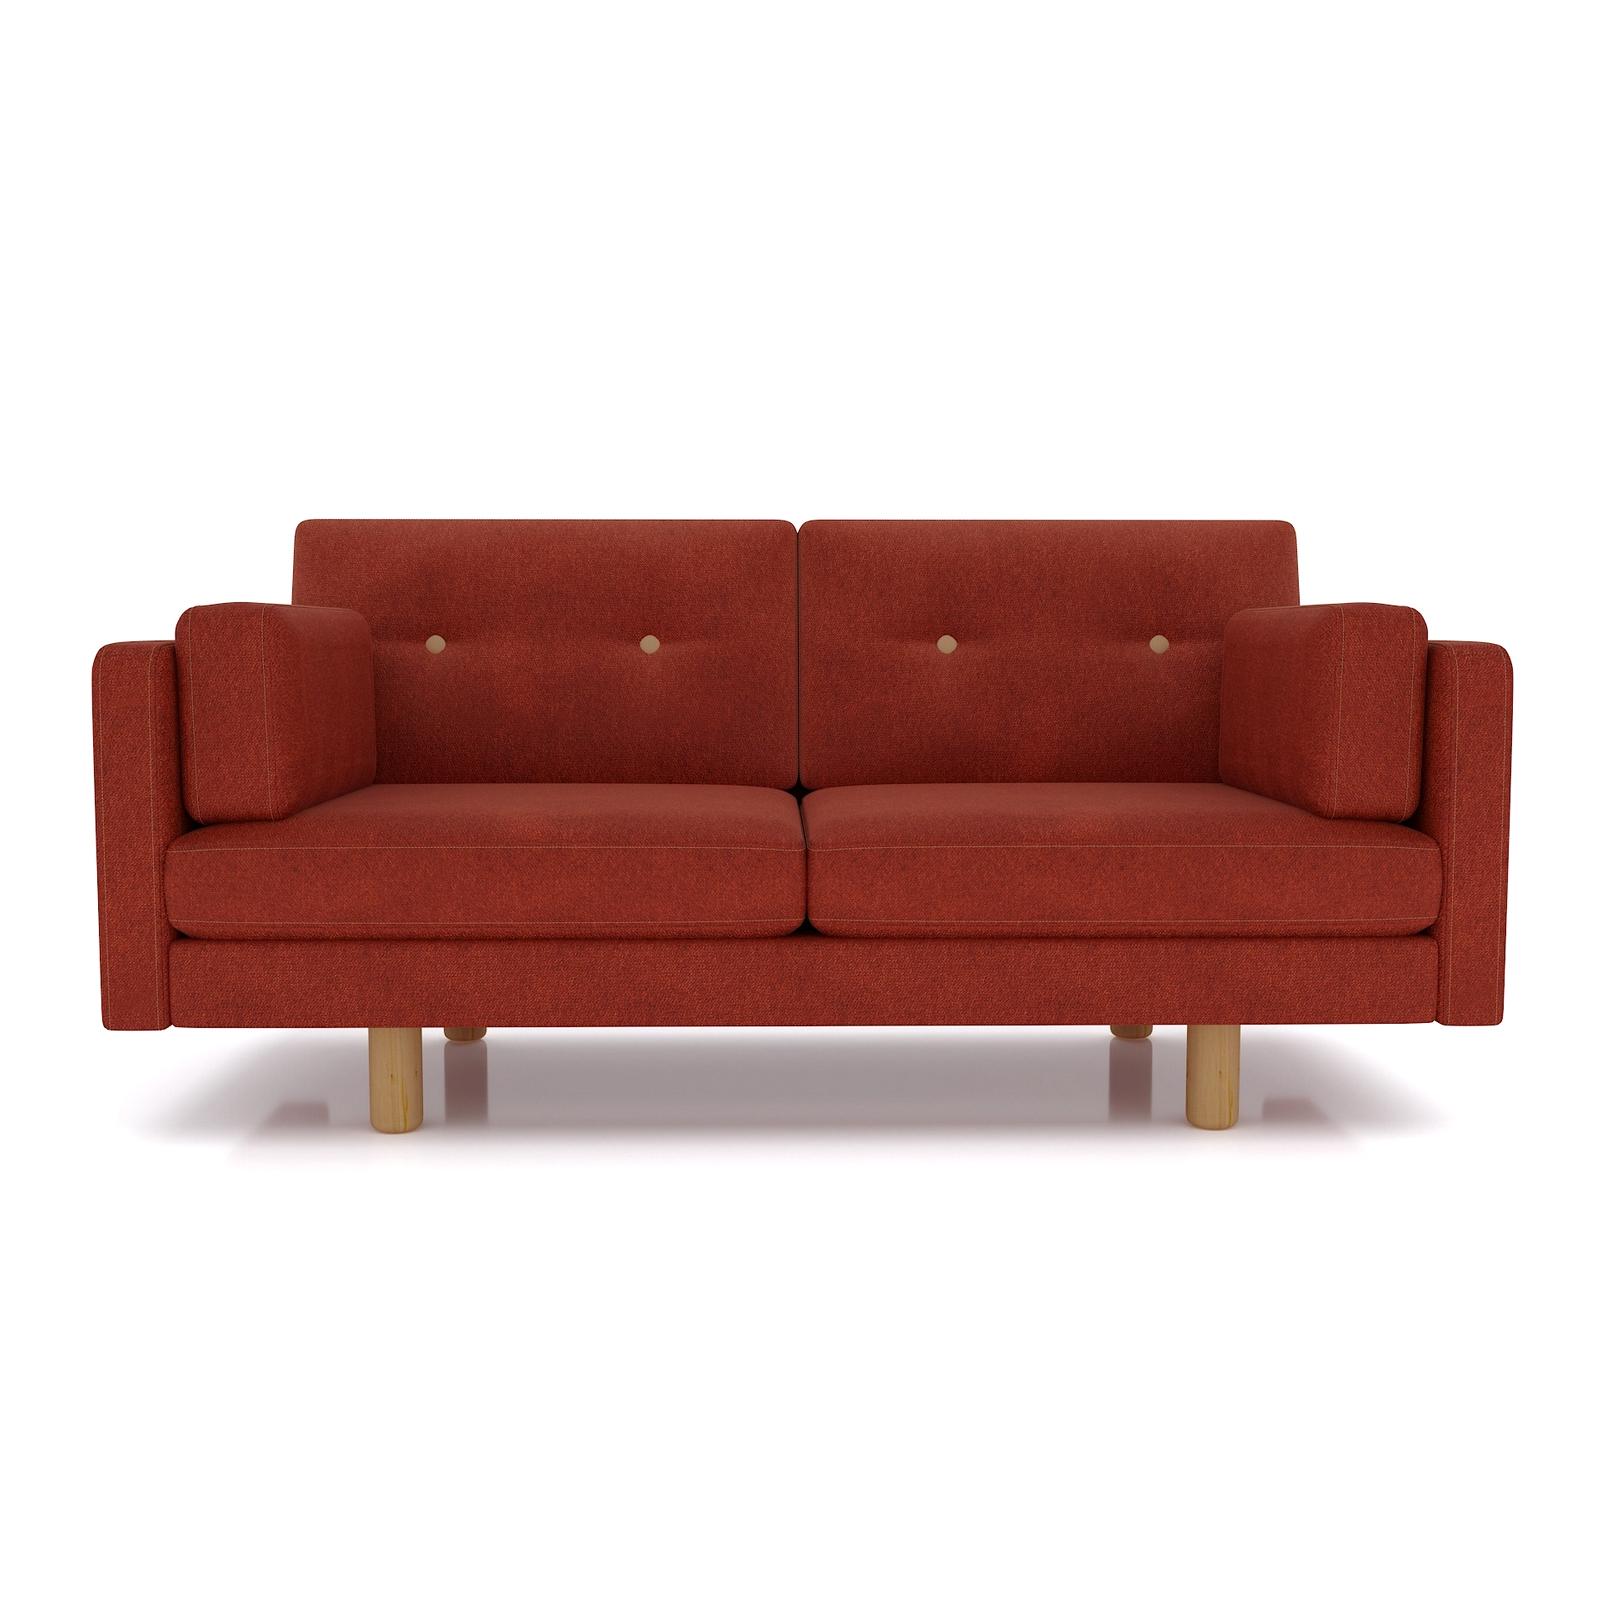 Фото - Диван AS Изабелла м 167x80x83 терракотовый диван as изабелла м 167x80x83 синий